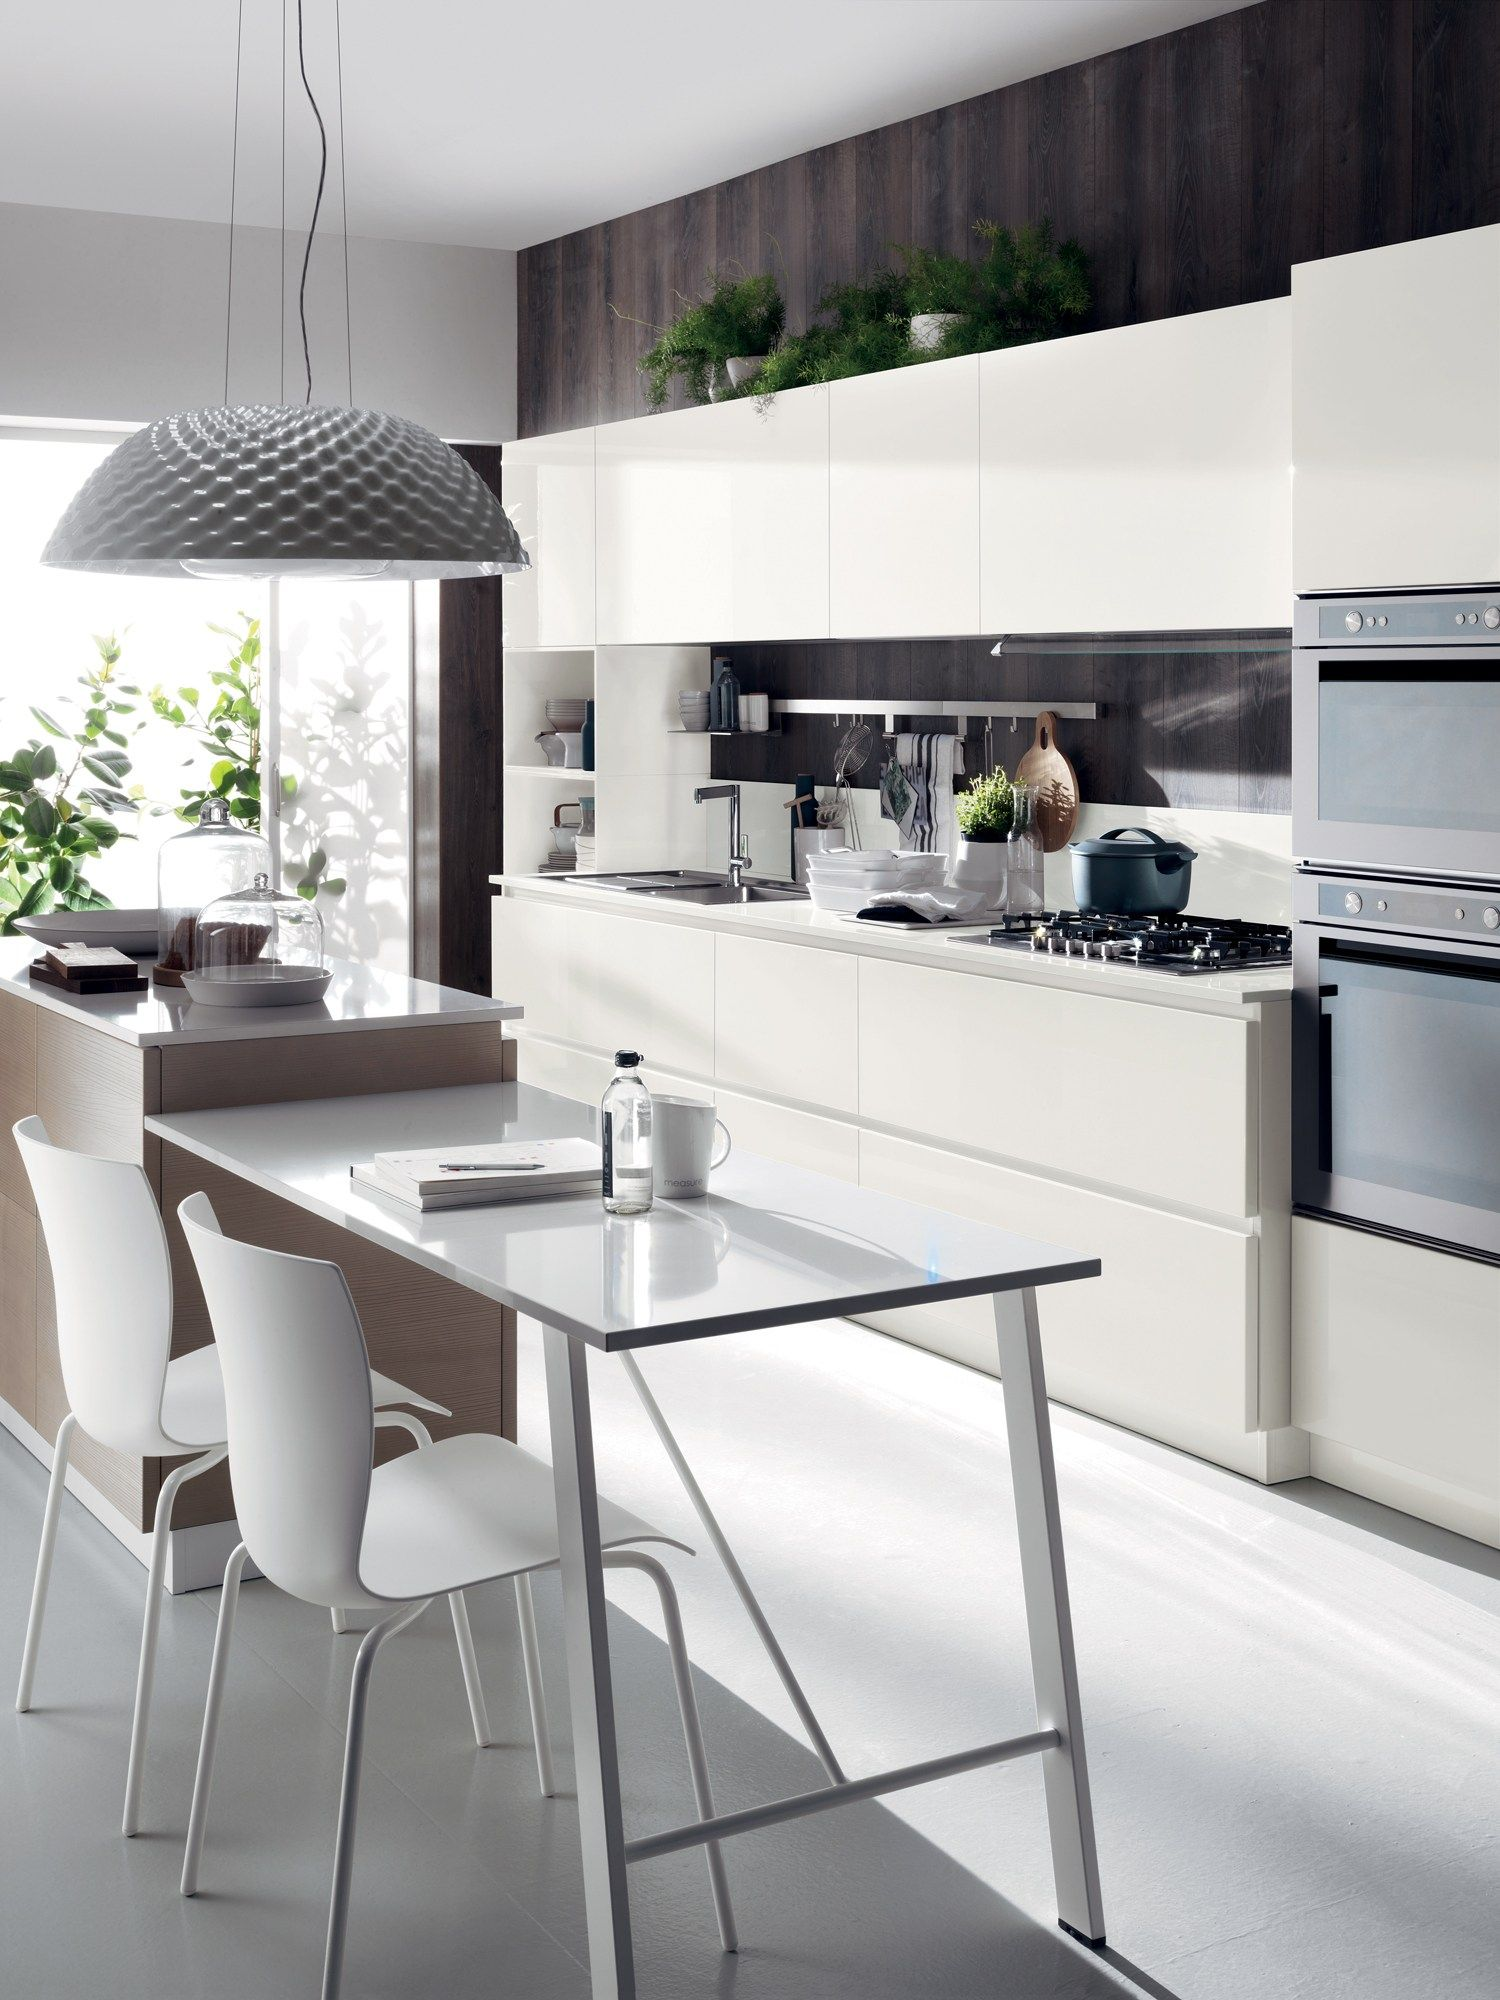 Fitted kitchen SCENERY Scavolini Modern kitchen